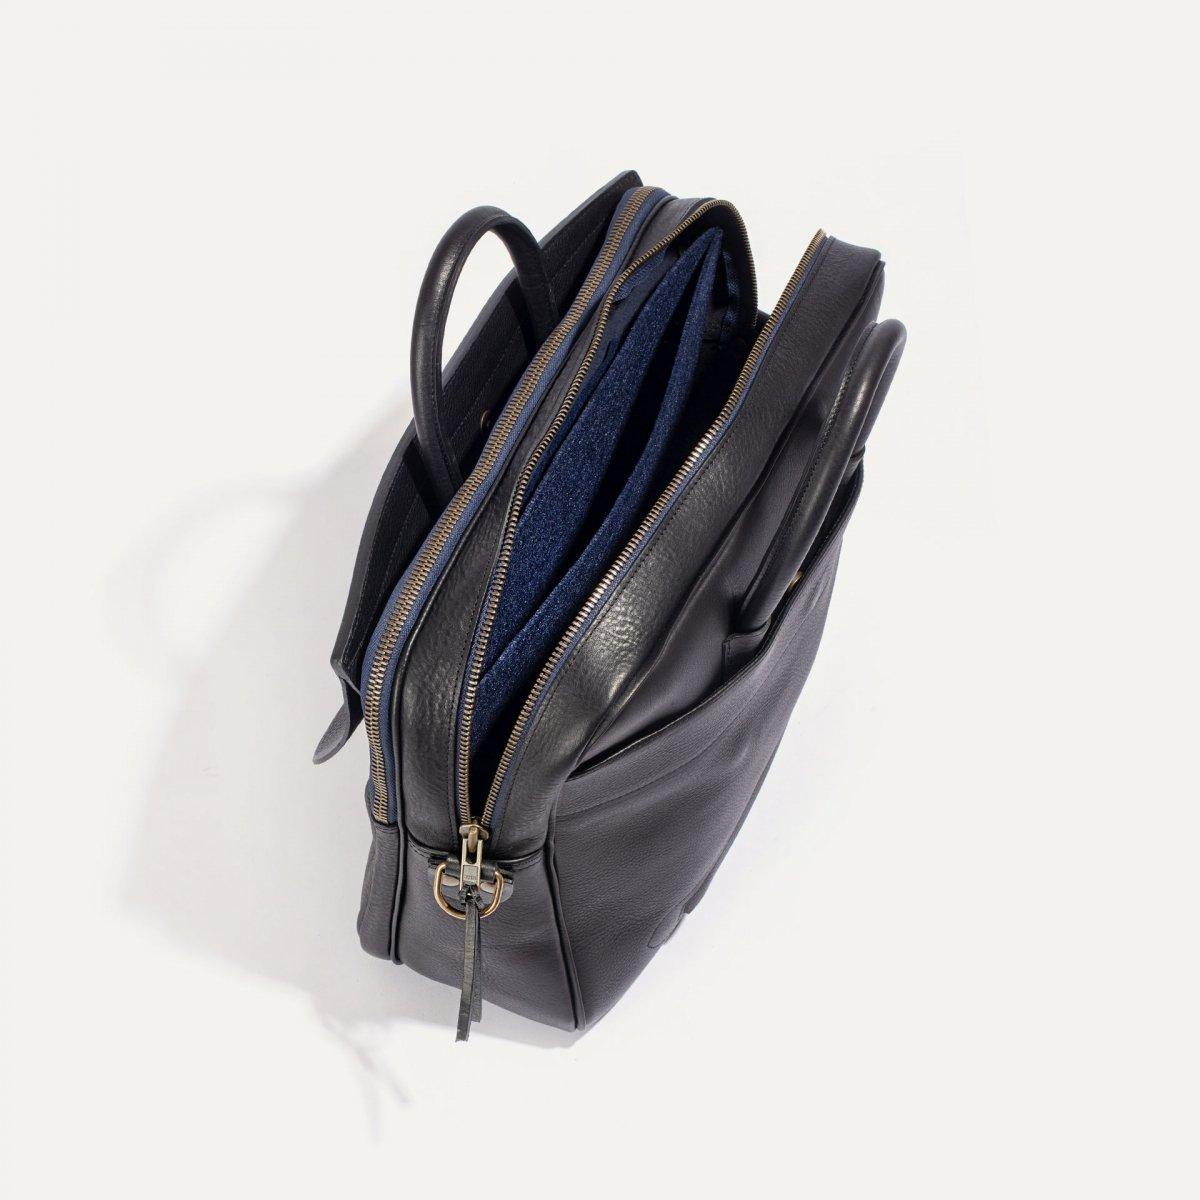 Zeppo Business bag - Black / E Pure (image n°4)